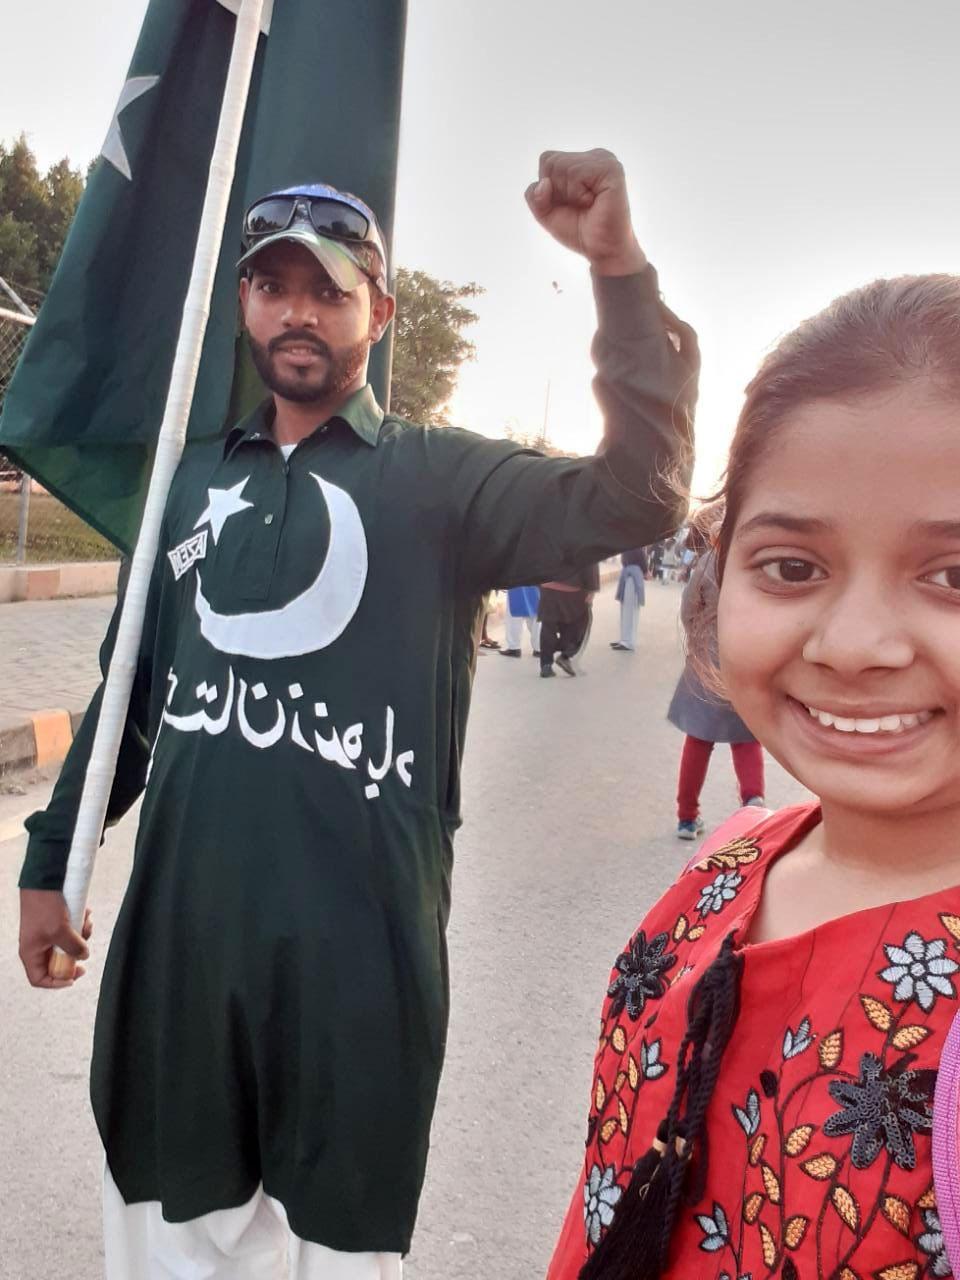 Zara Imran with one volunteer of Rangers